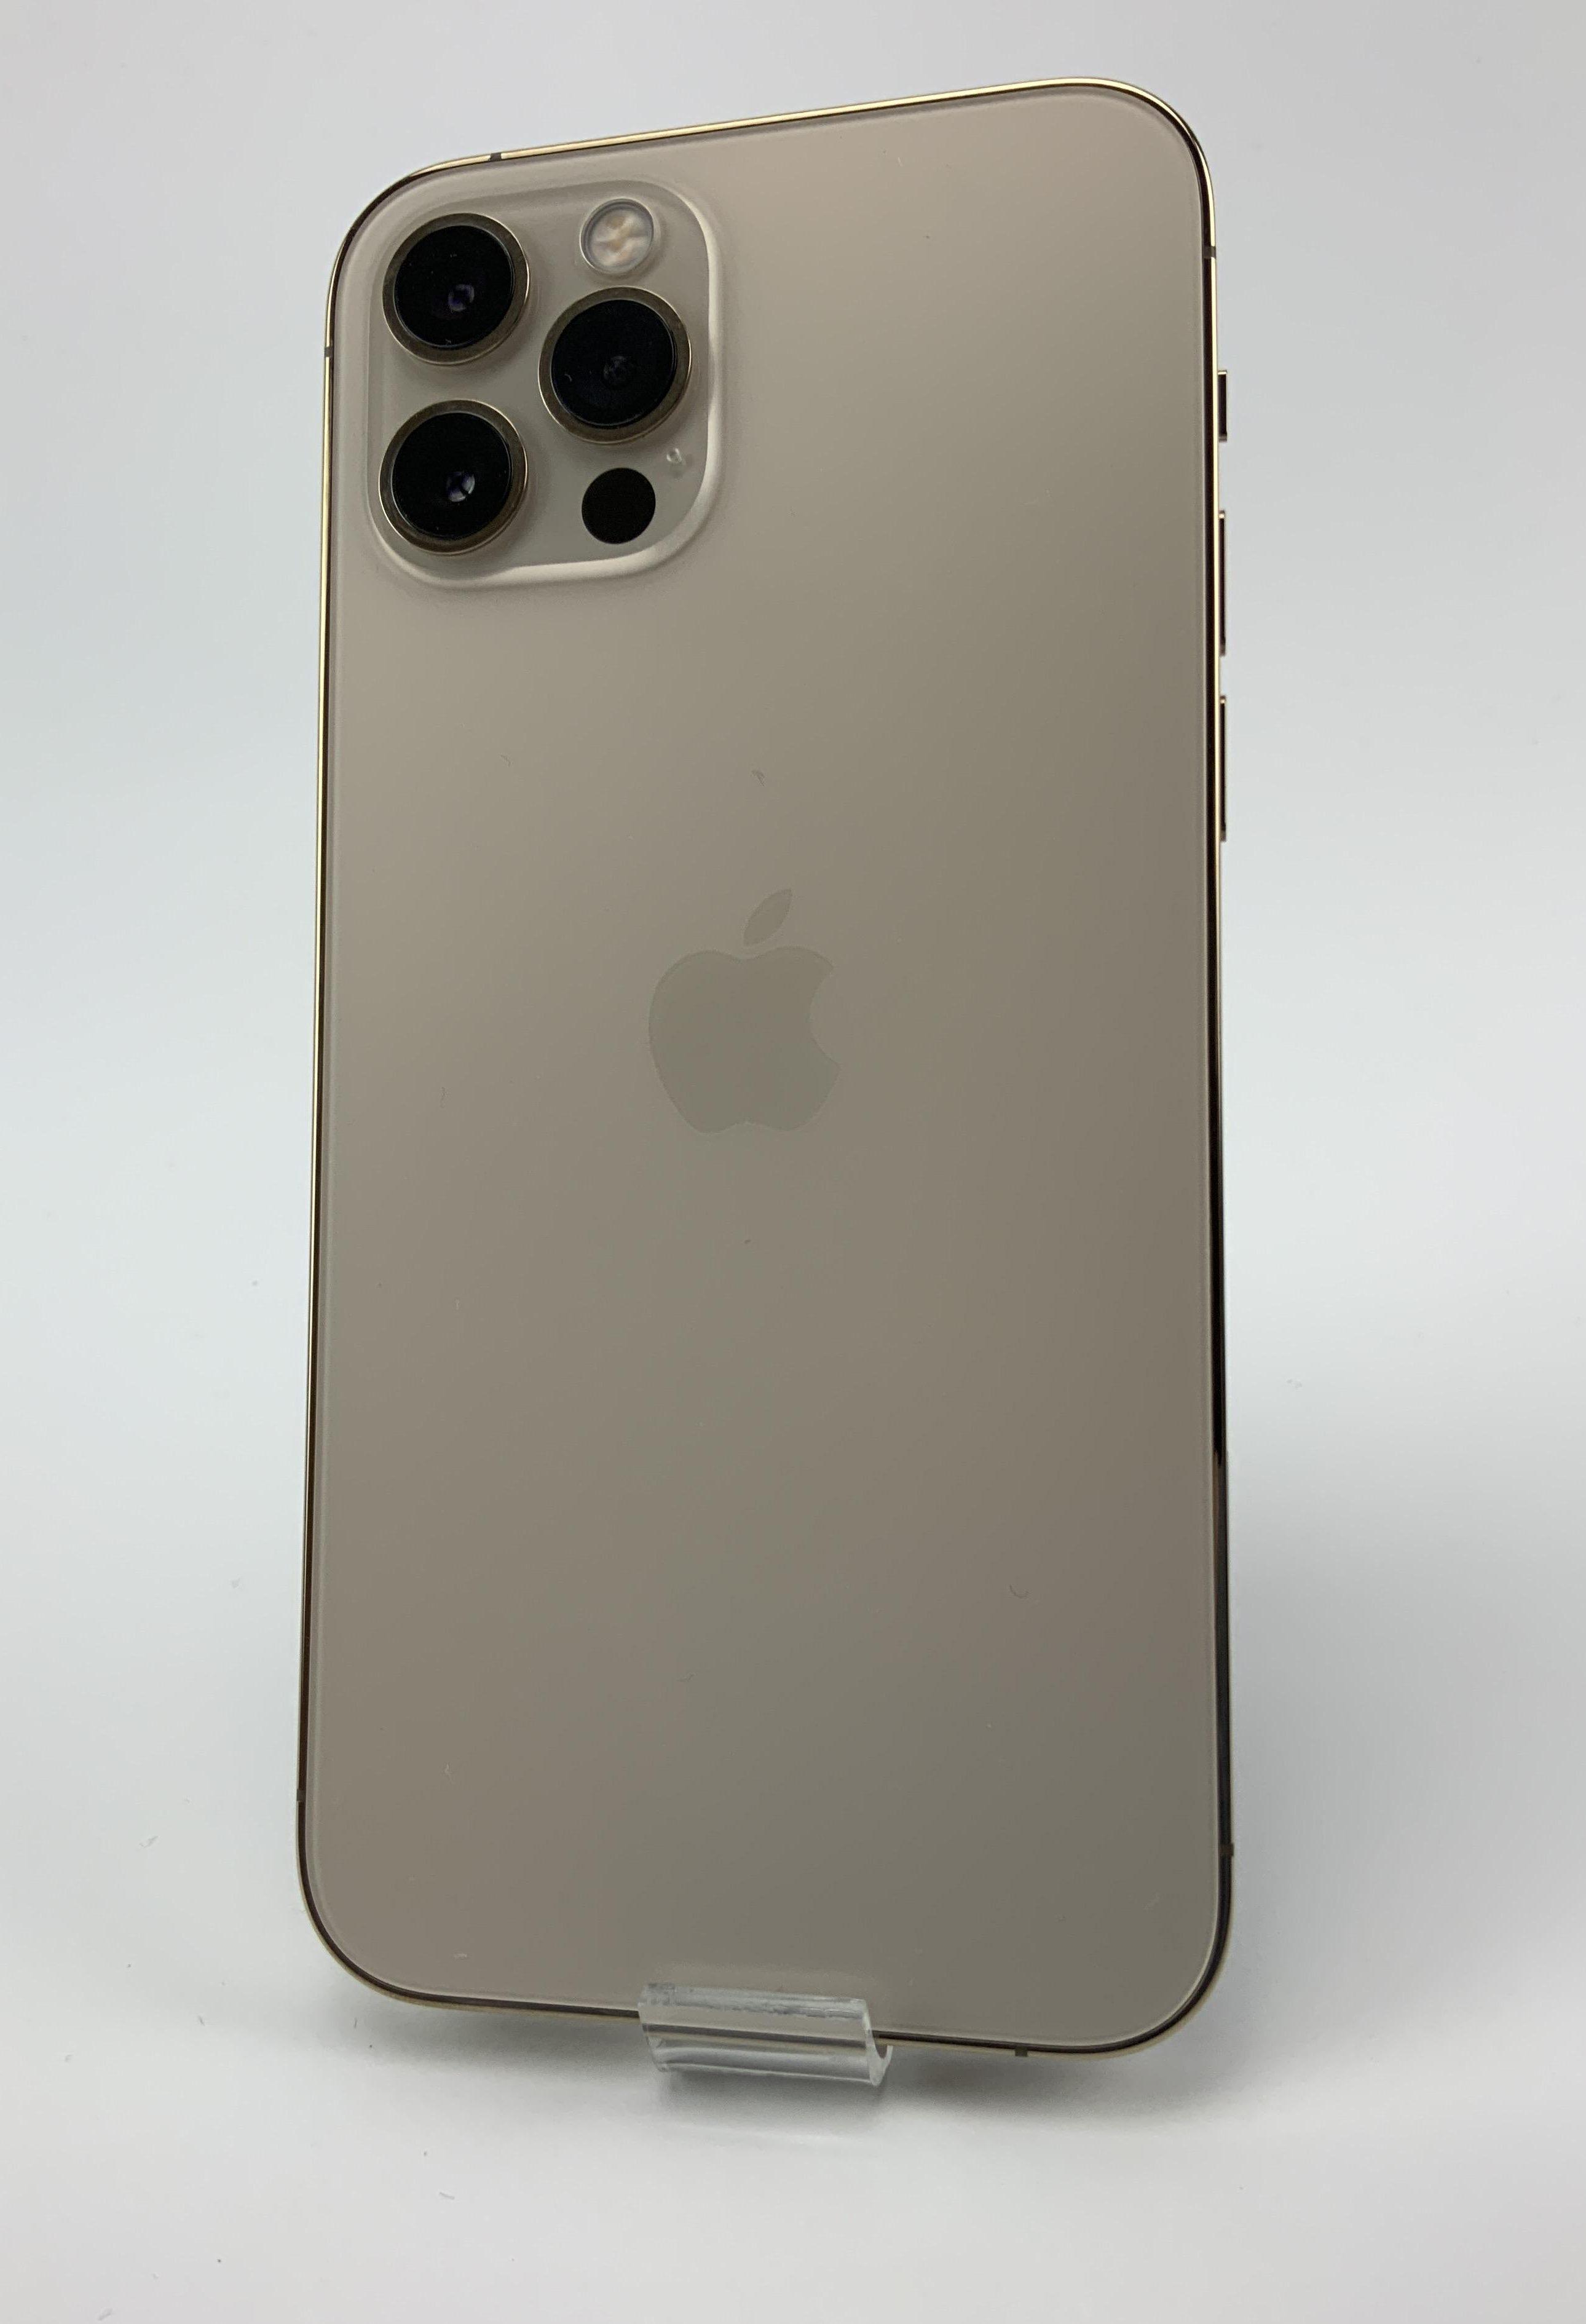 iPhone 12 Pro 512GB, 512GB, Gold, Bild 2